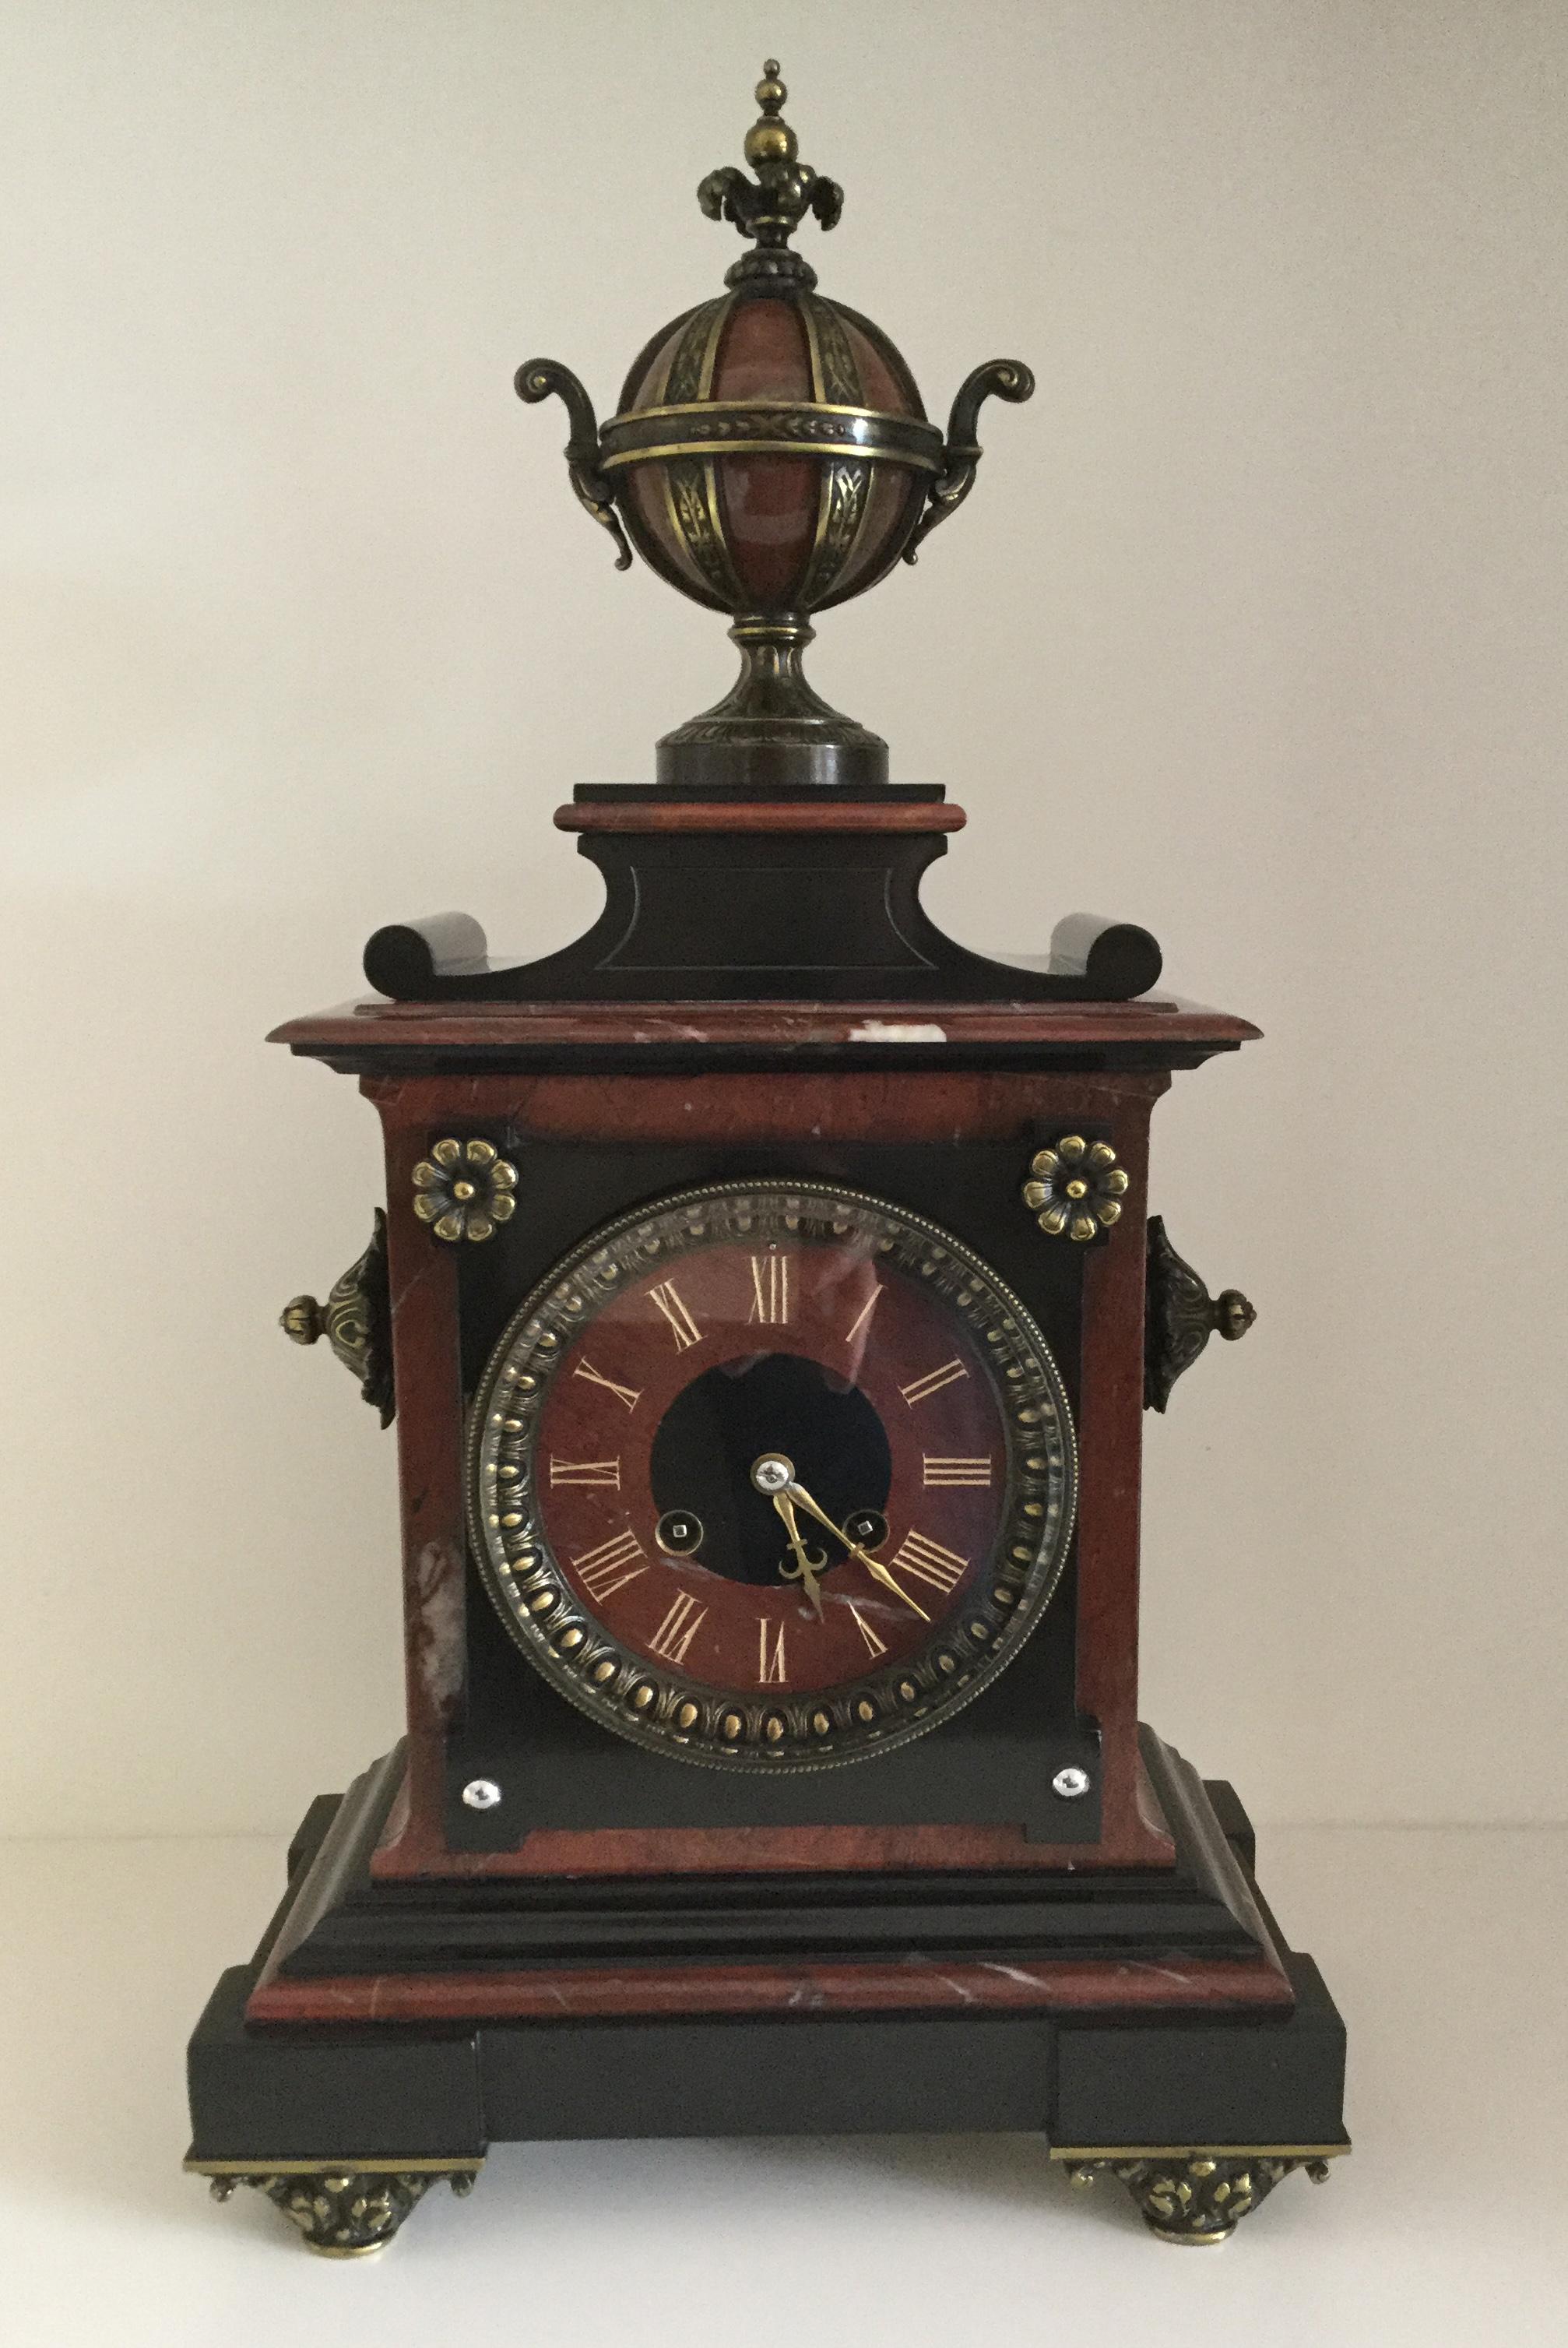 Louis XV Style Mantel Clock